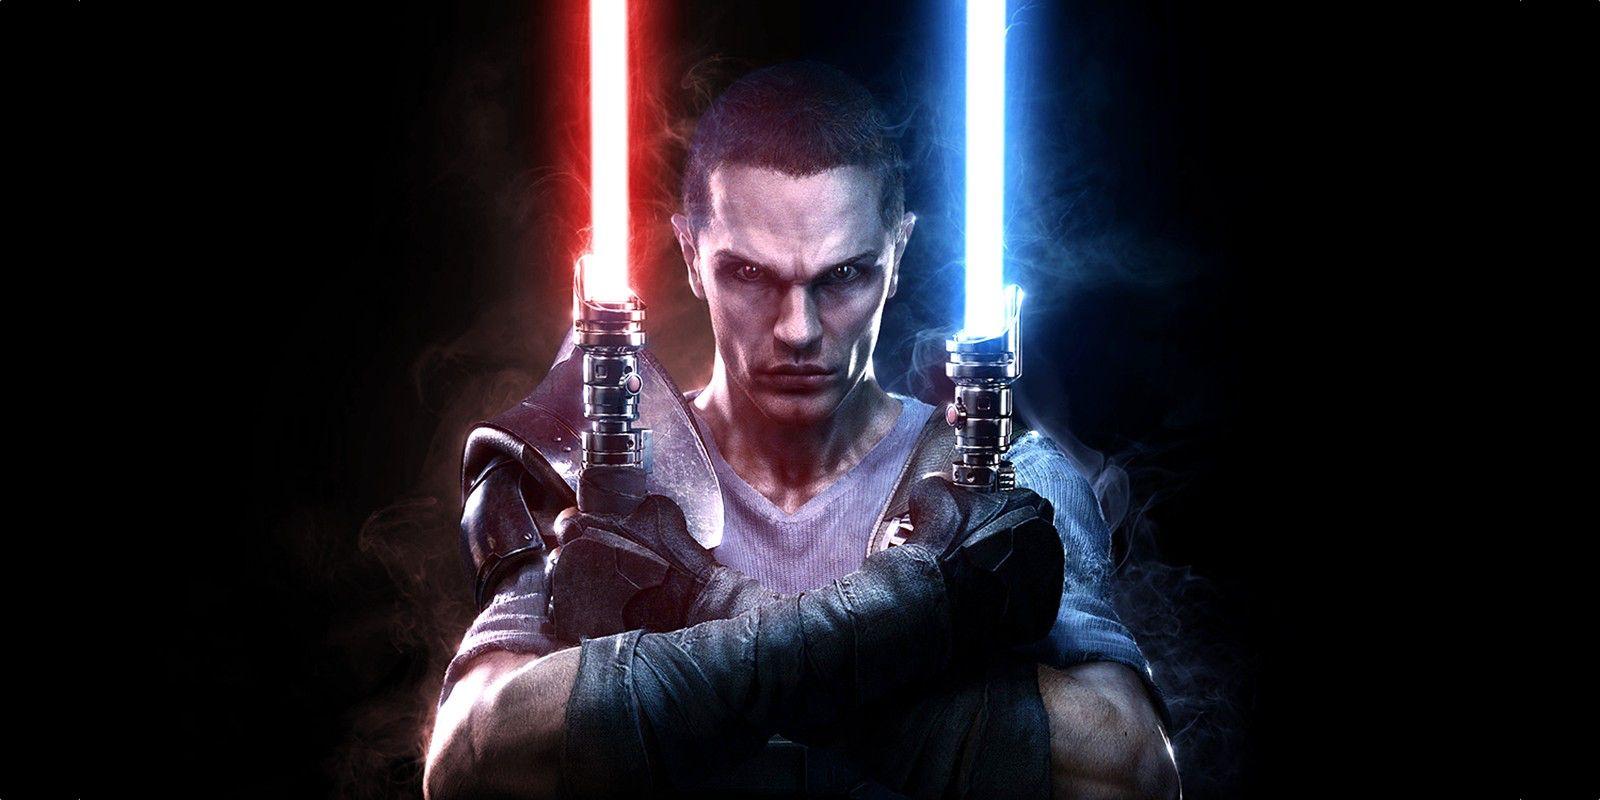 Is Starkiller Canon in Star Wars?